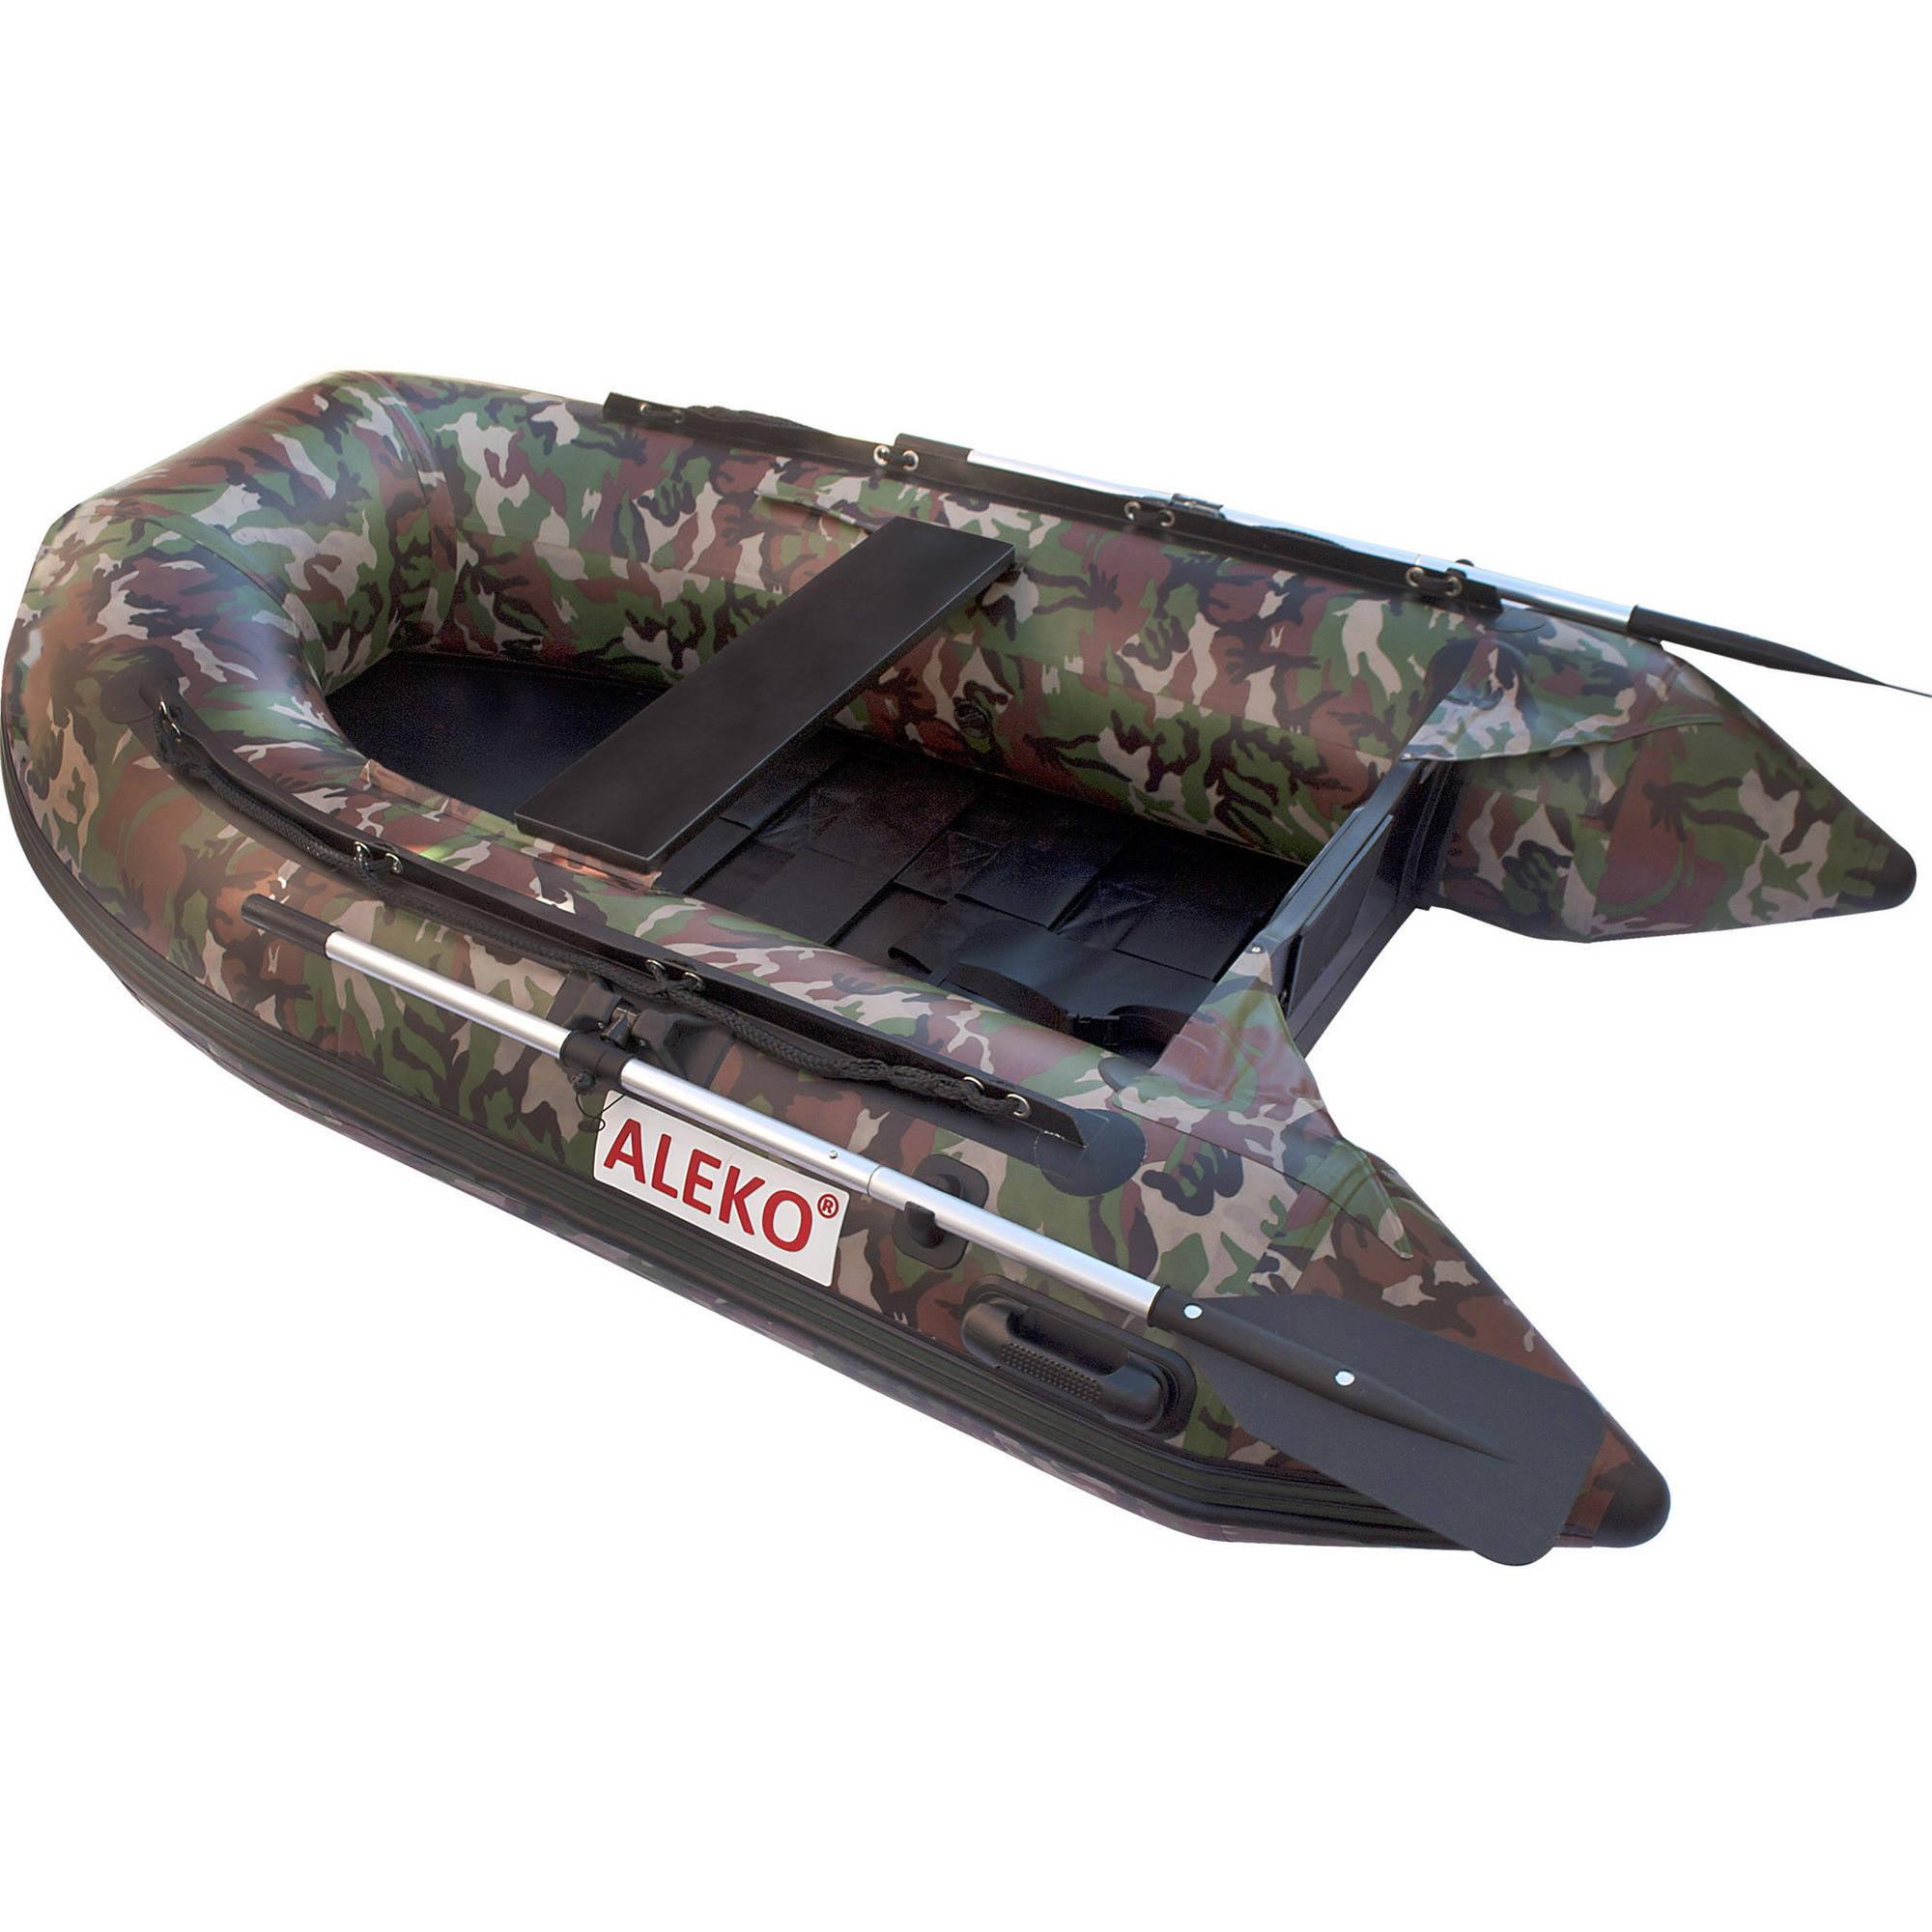 ALEKO Inflatable Boat - Pre-Installed Slide Floor - 3-Person - 8.4 Feet - Camouflage